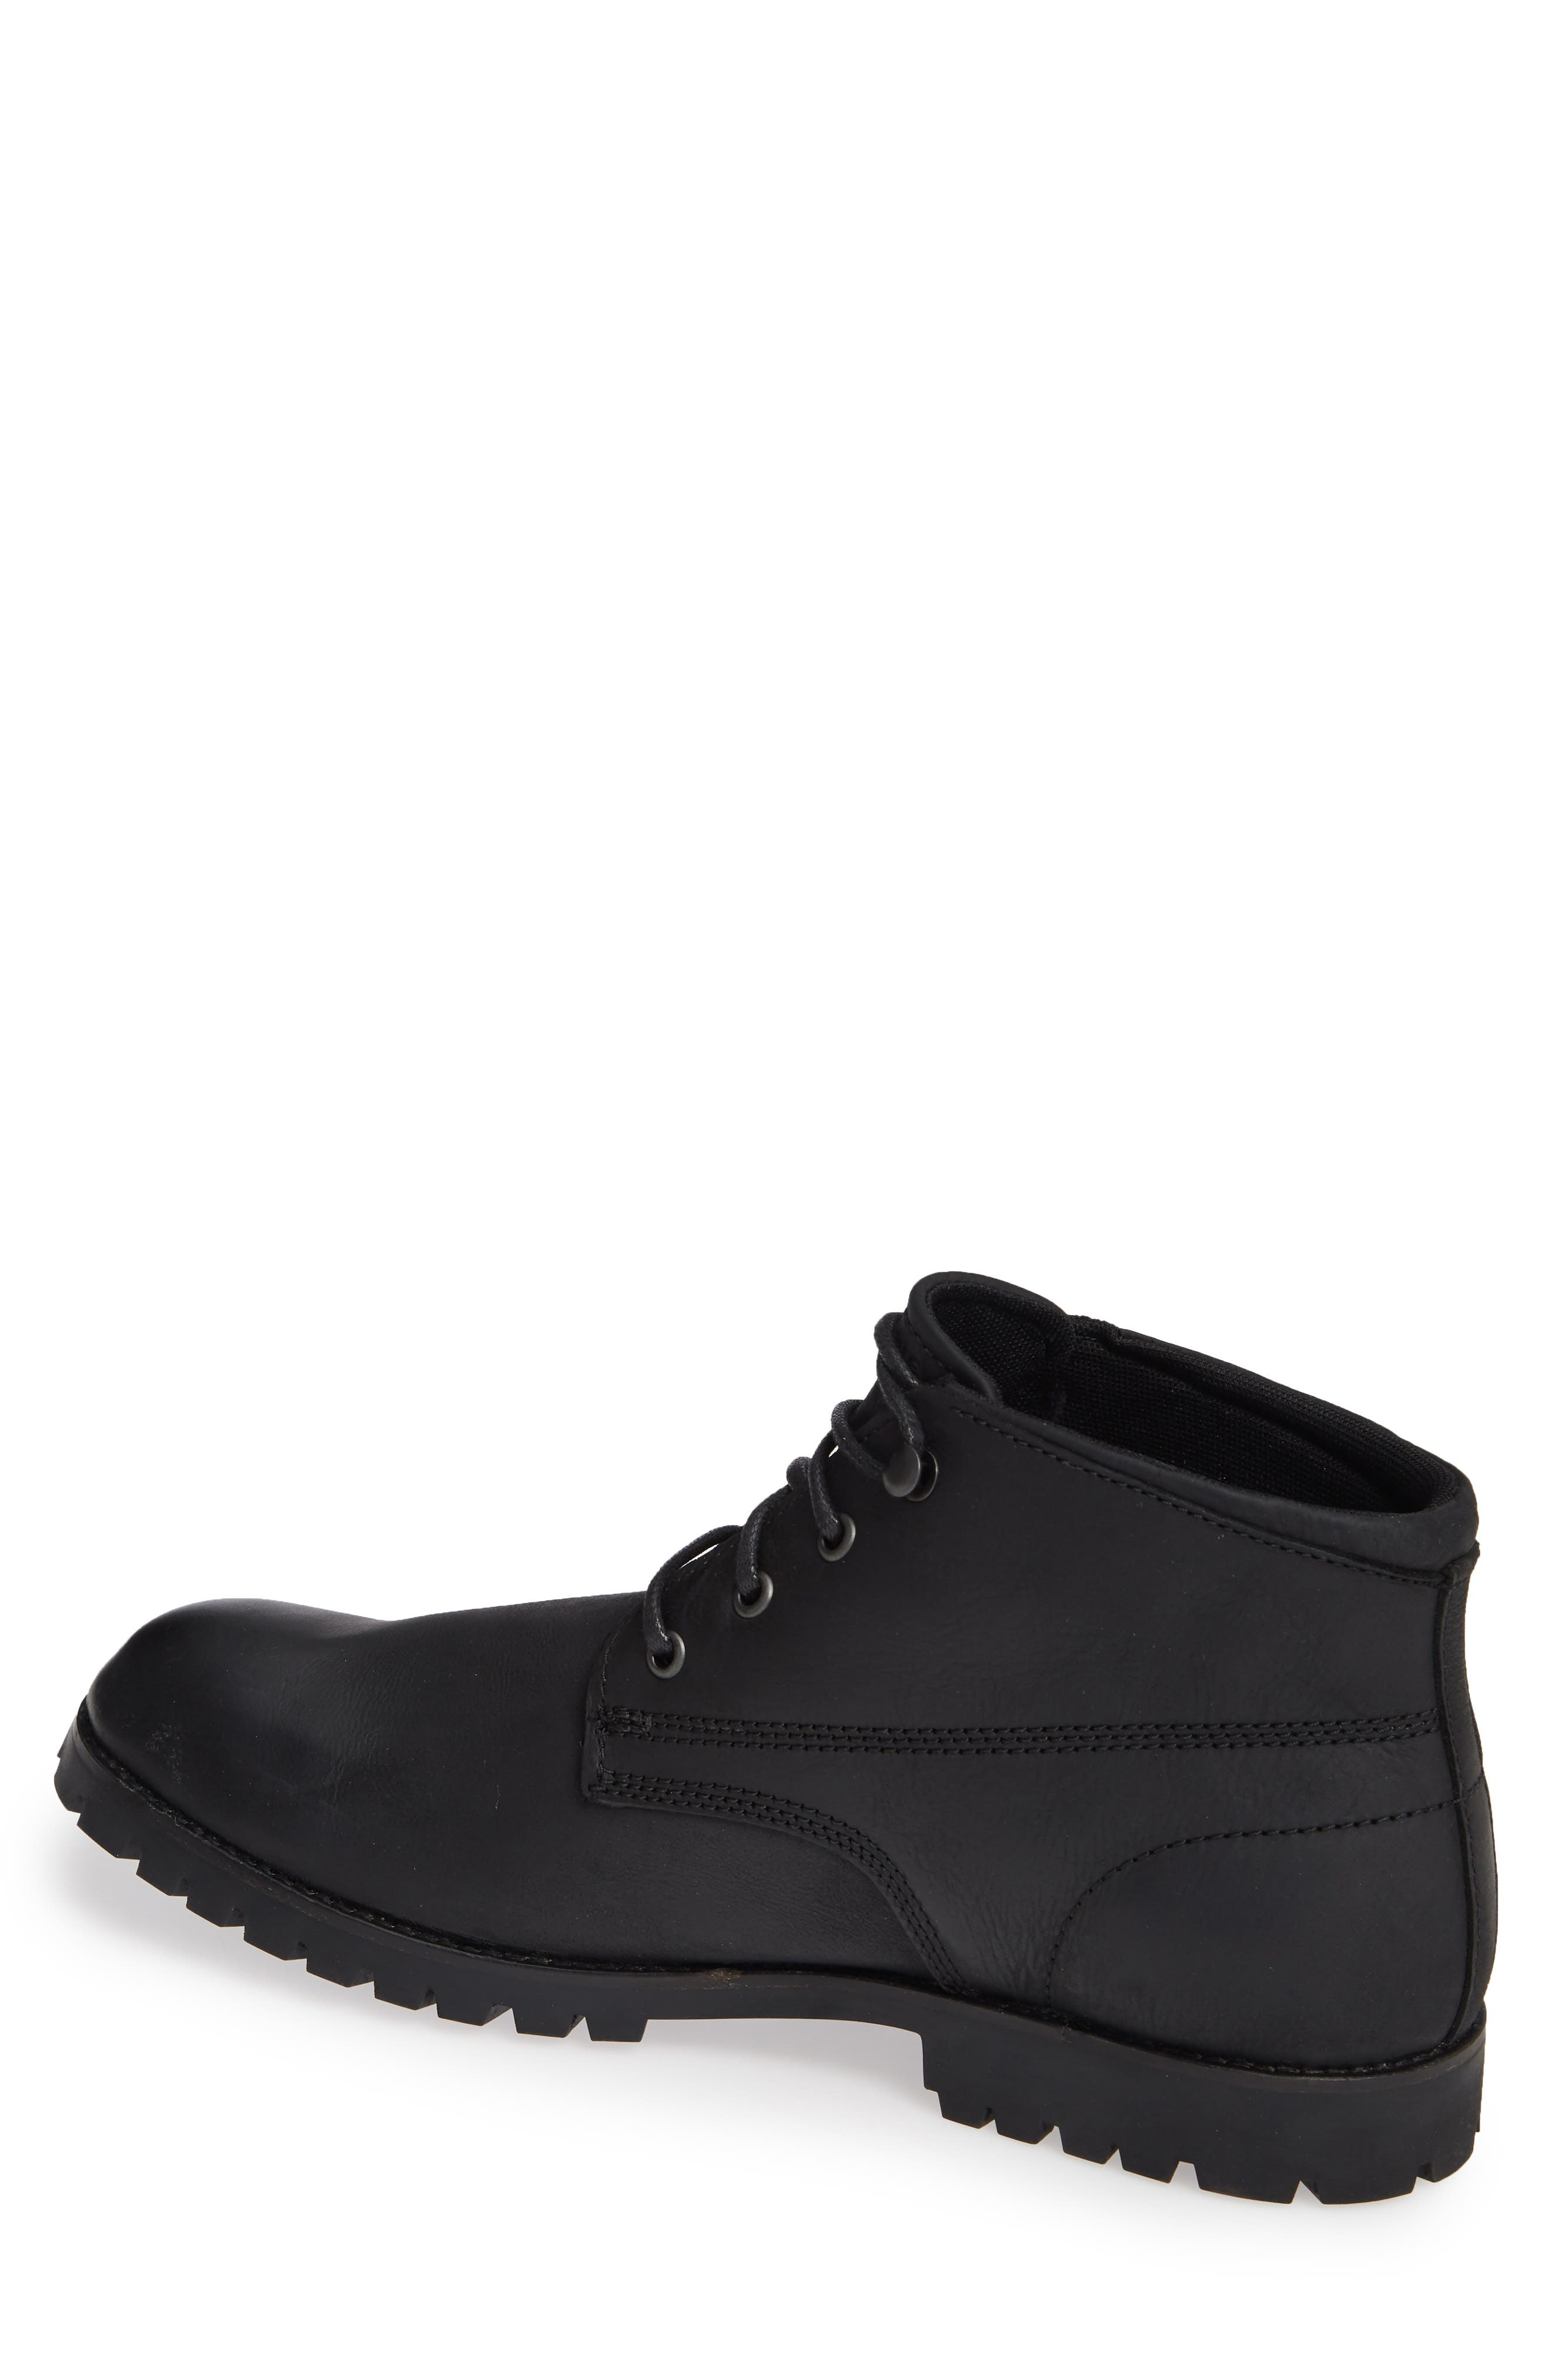 WOLVERINE,                             Cort Plain Toe Waterproof Boot,                             Alternate thumbnail 2, color,                             MEDIUM BLACK